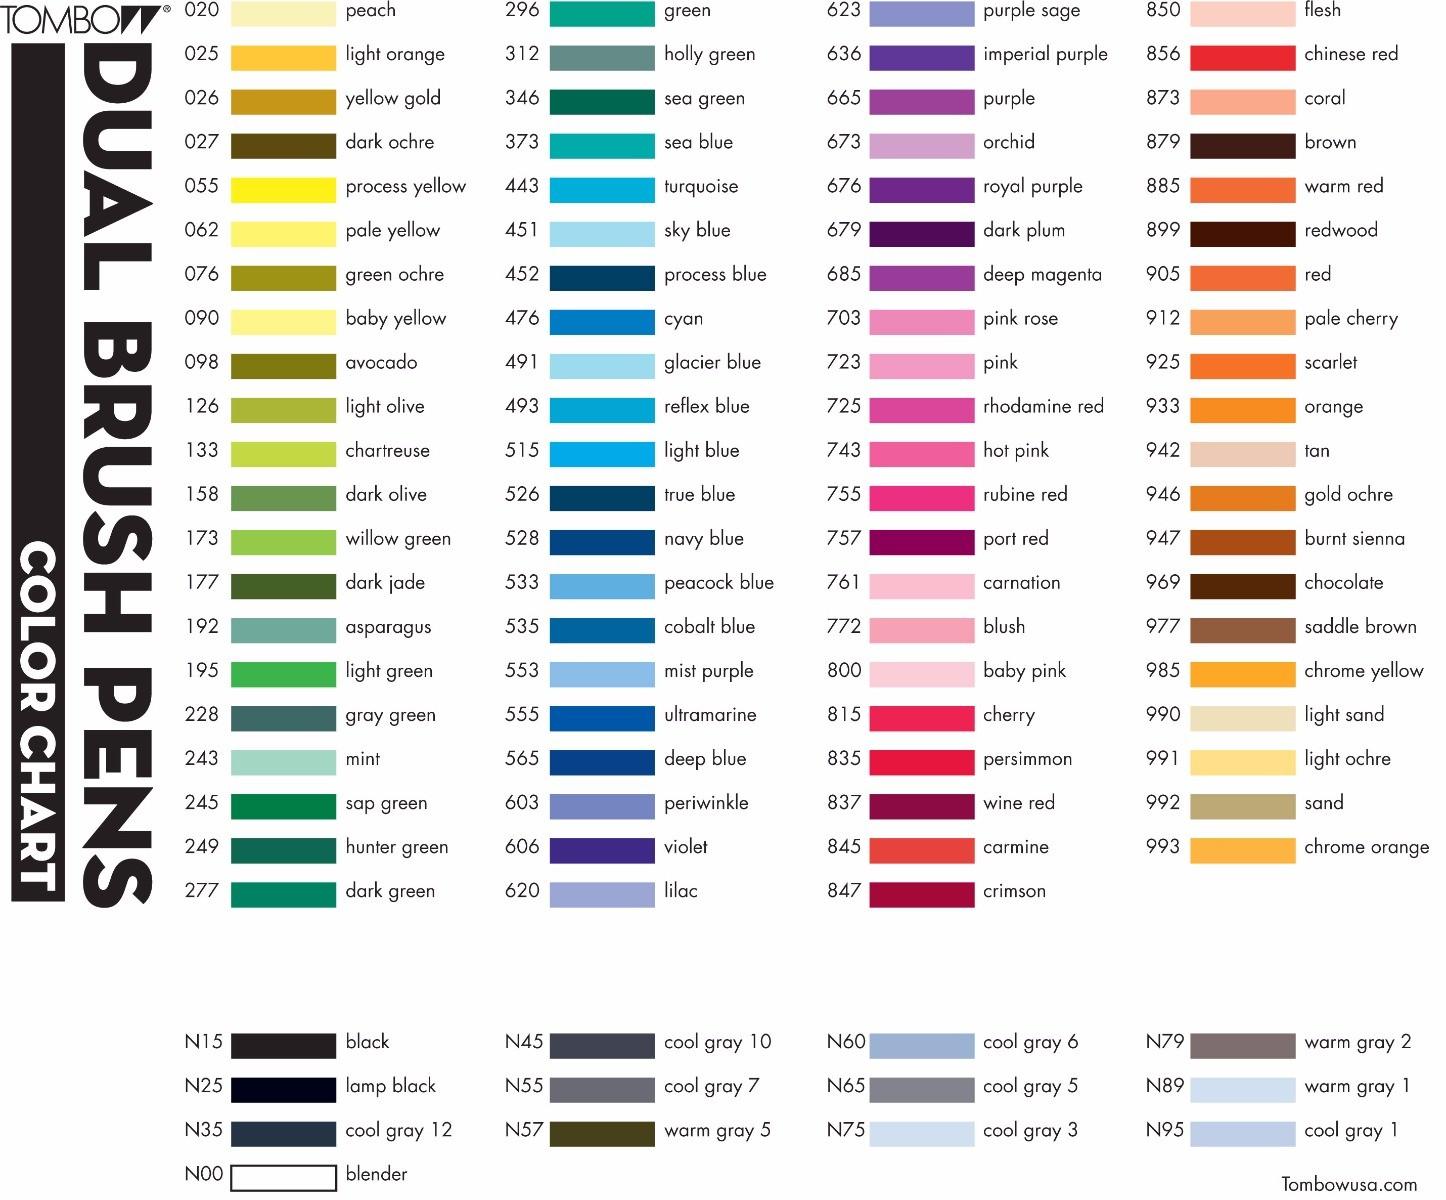 Tombow Abt Pens Colour Chart